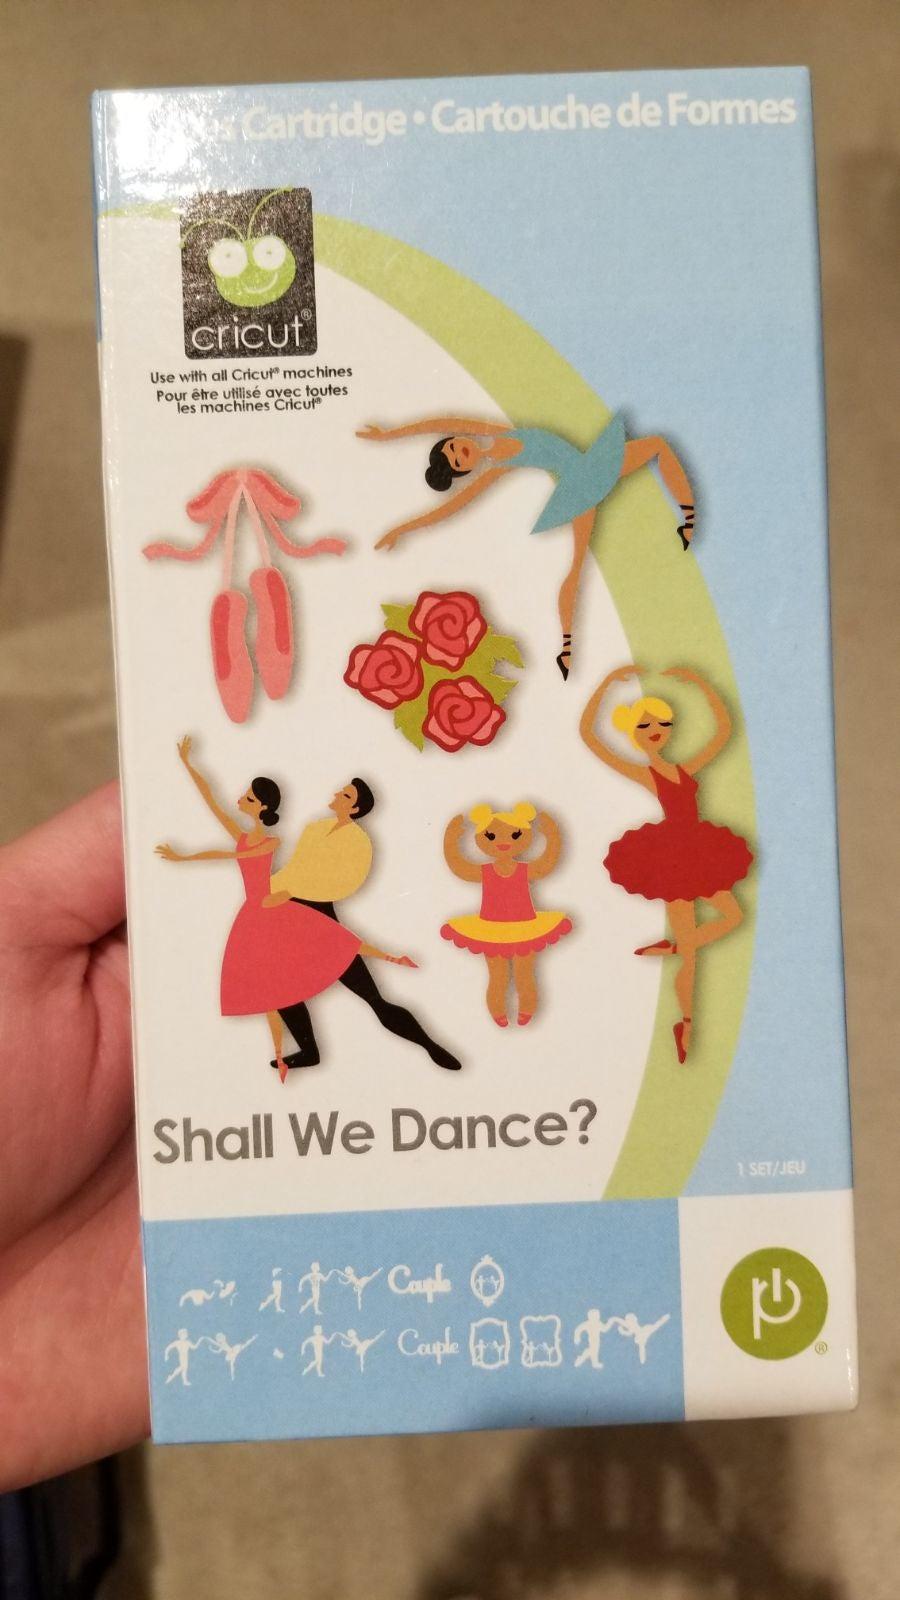 Cricut Shall We Dance cartridge LINKED